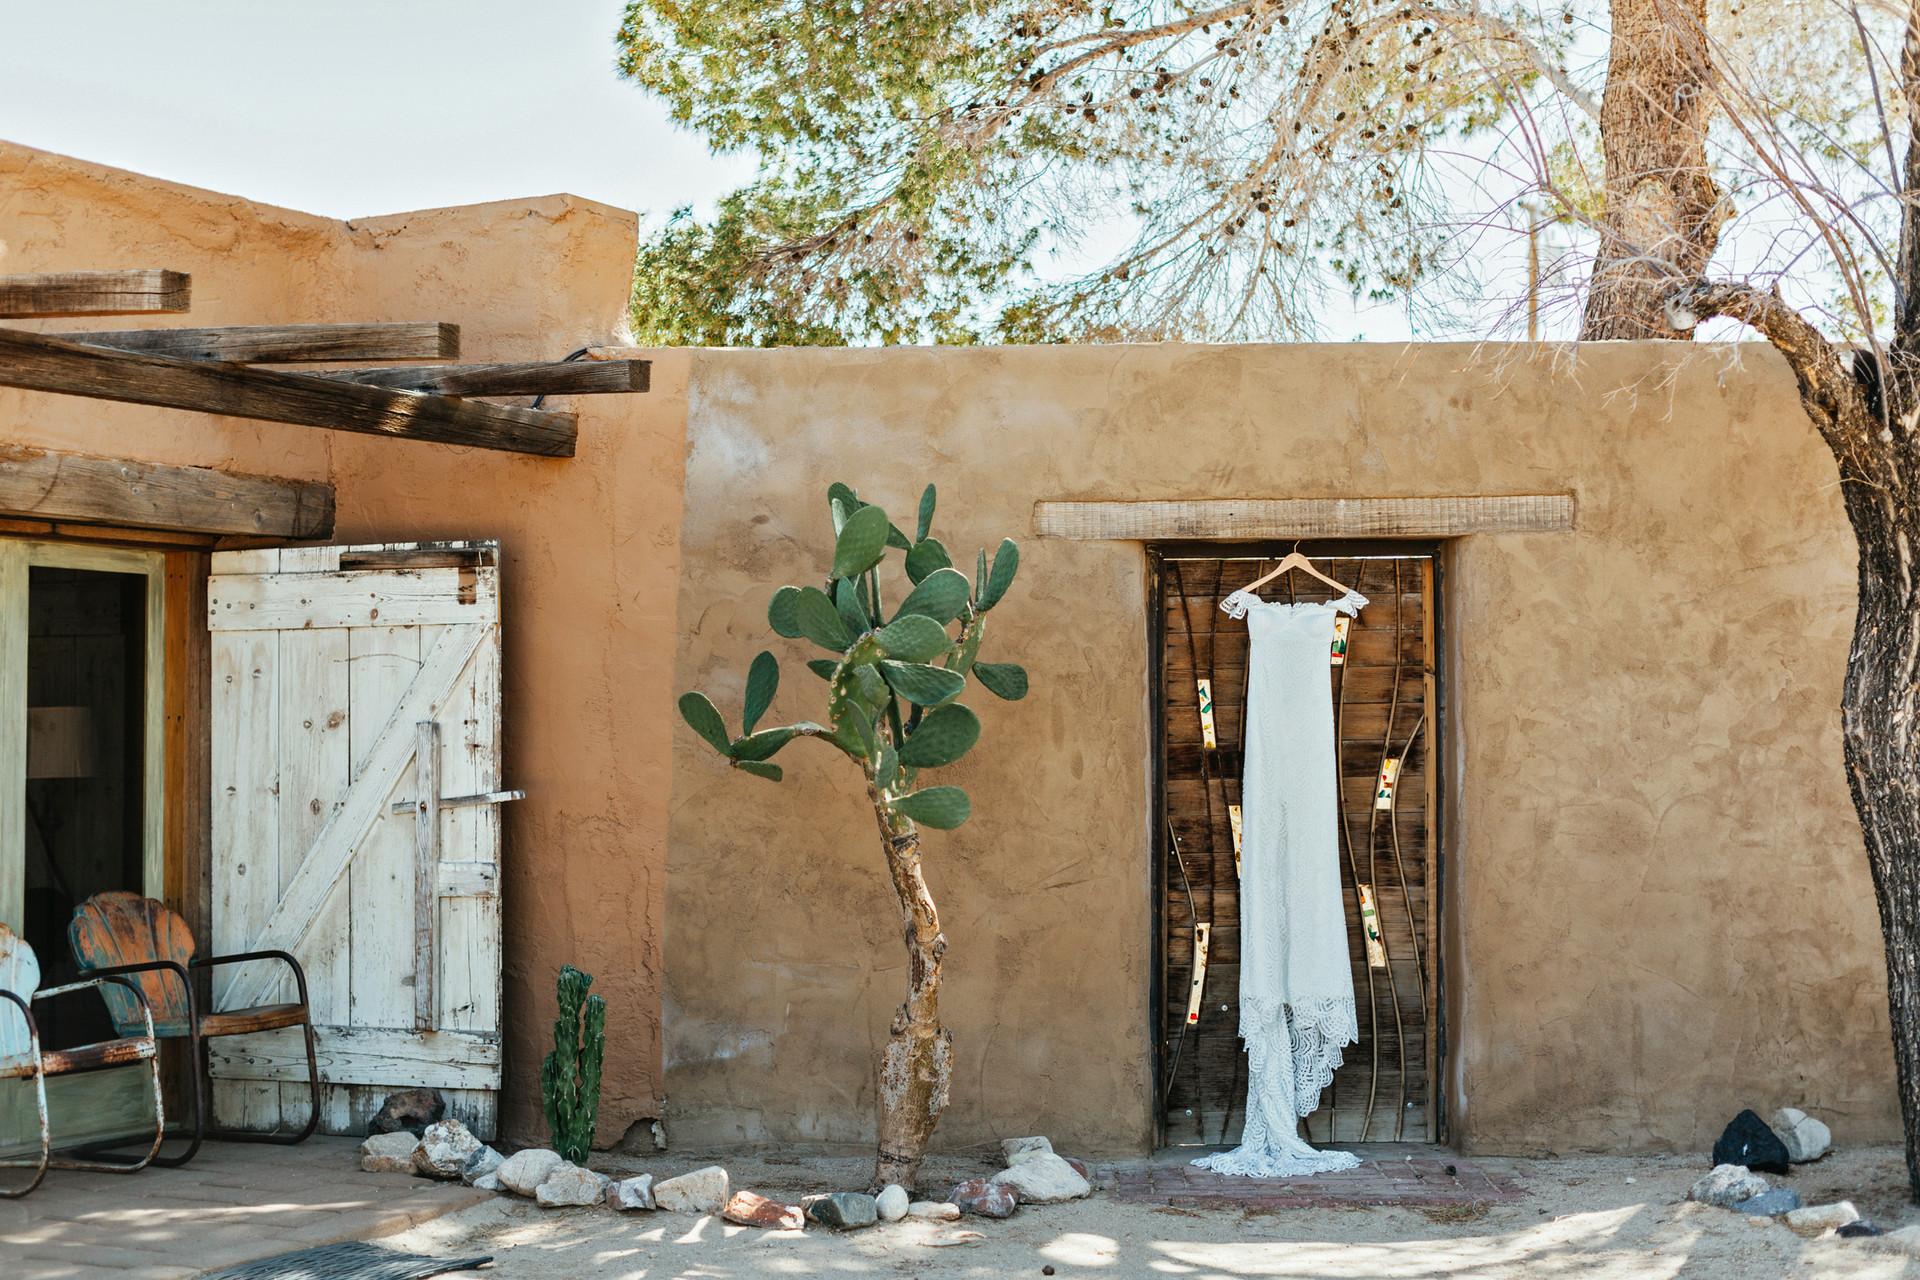 grace loves lace dress hanging in desert setting